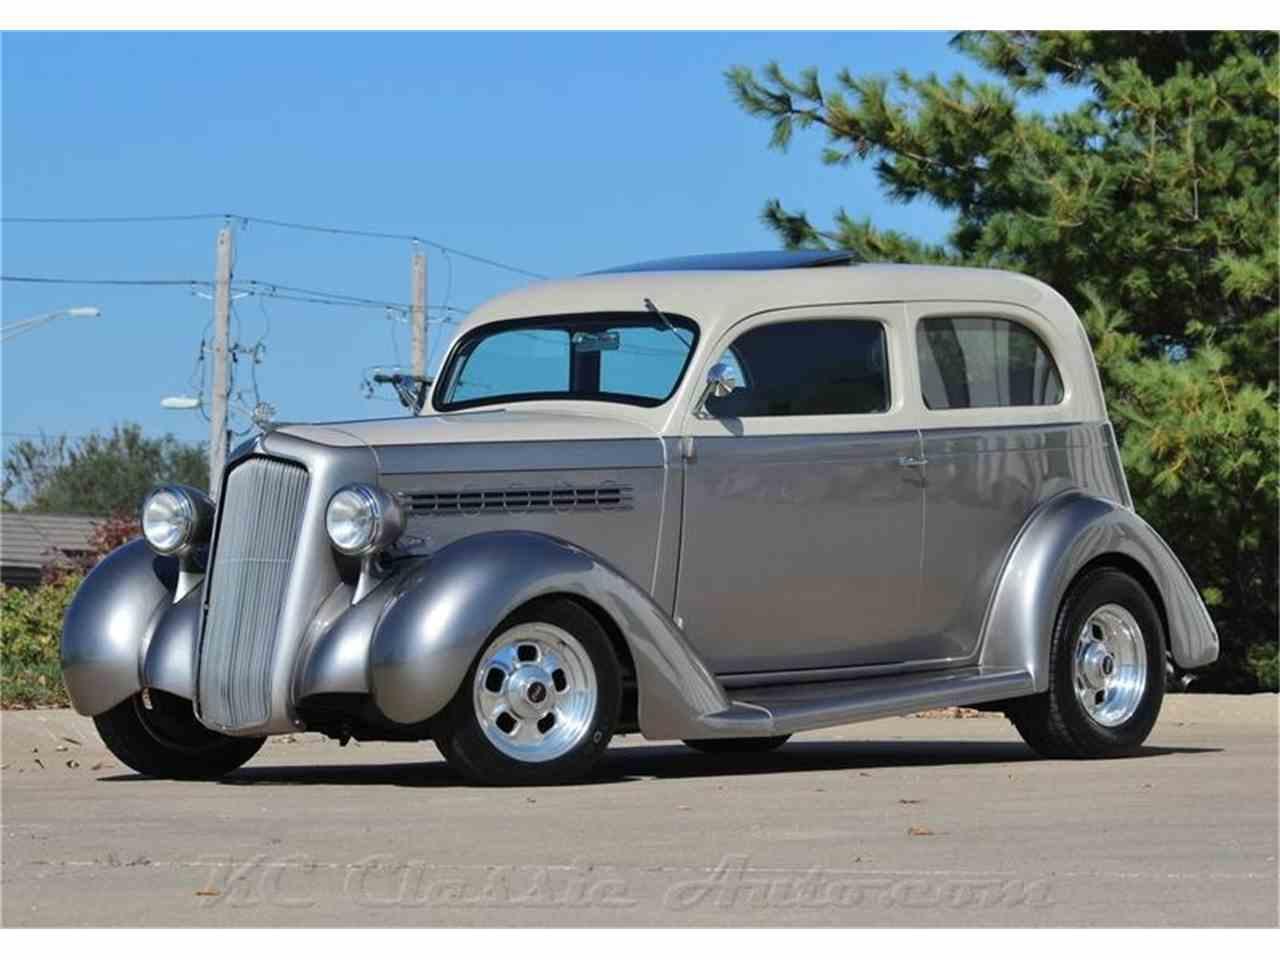 1935 plymouth 2 door sedan pj 454 big block hot rod with for 1935 plymouth 2 door sedan